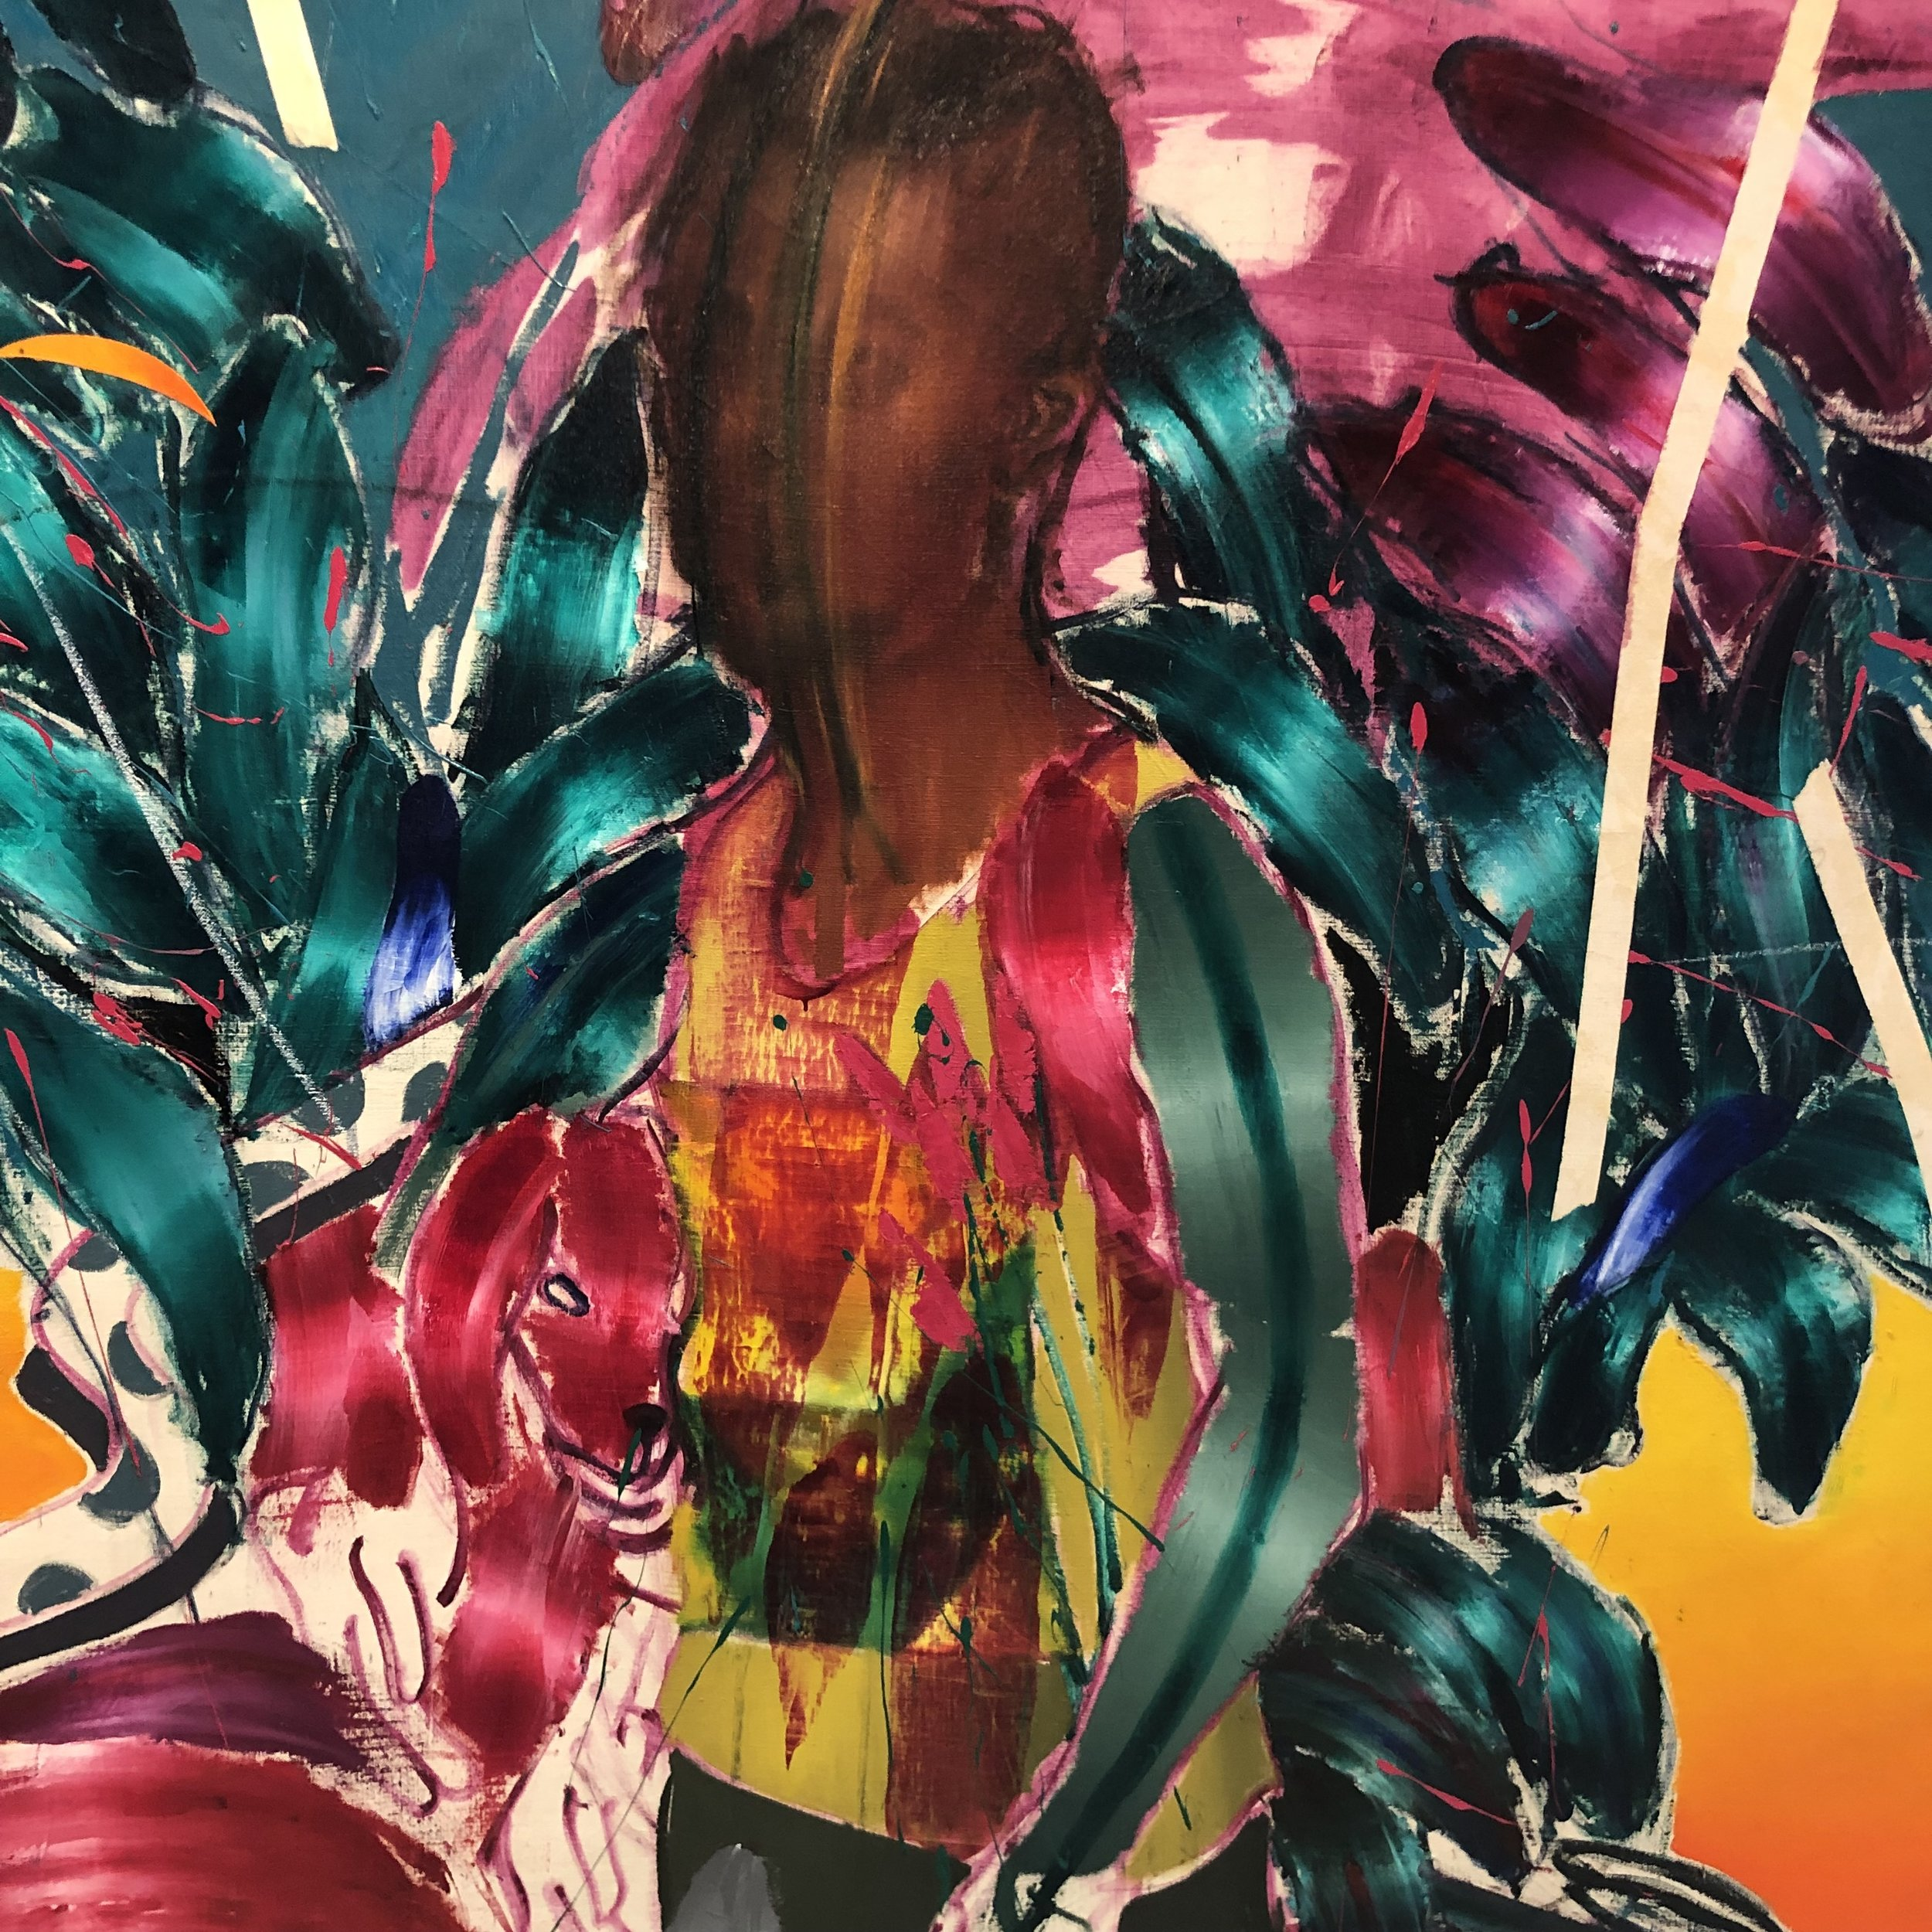 'Kid I (Self Portrait)' , 61cm x 137cm x 152cm (Diptych) oil, oil stick on canvas 2017, Chibuike Uzoma